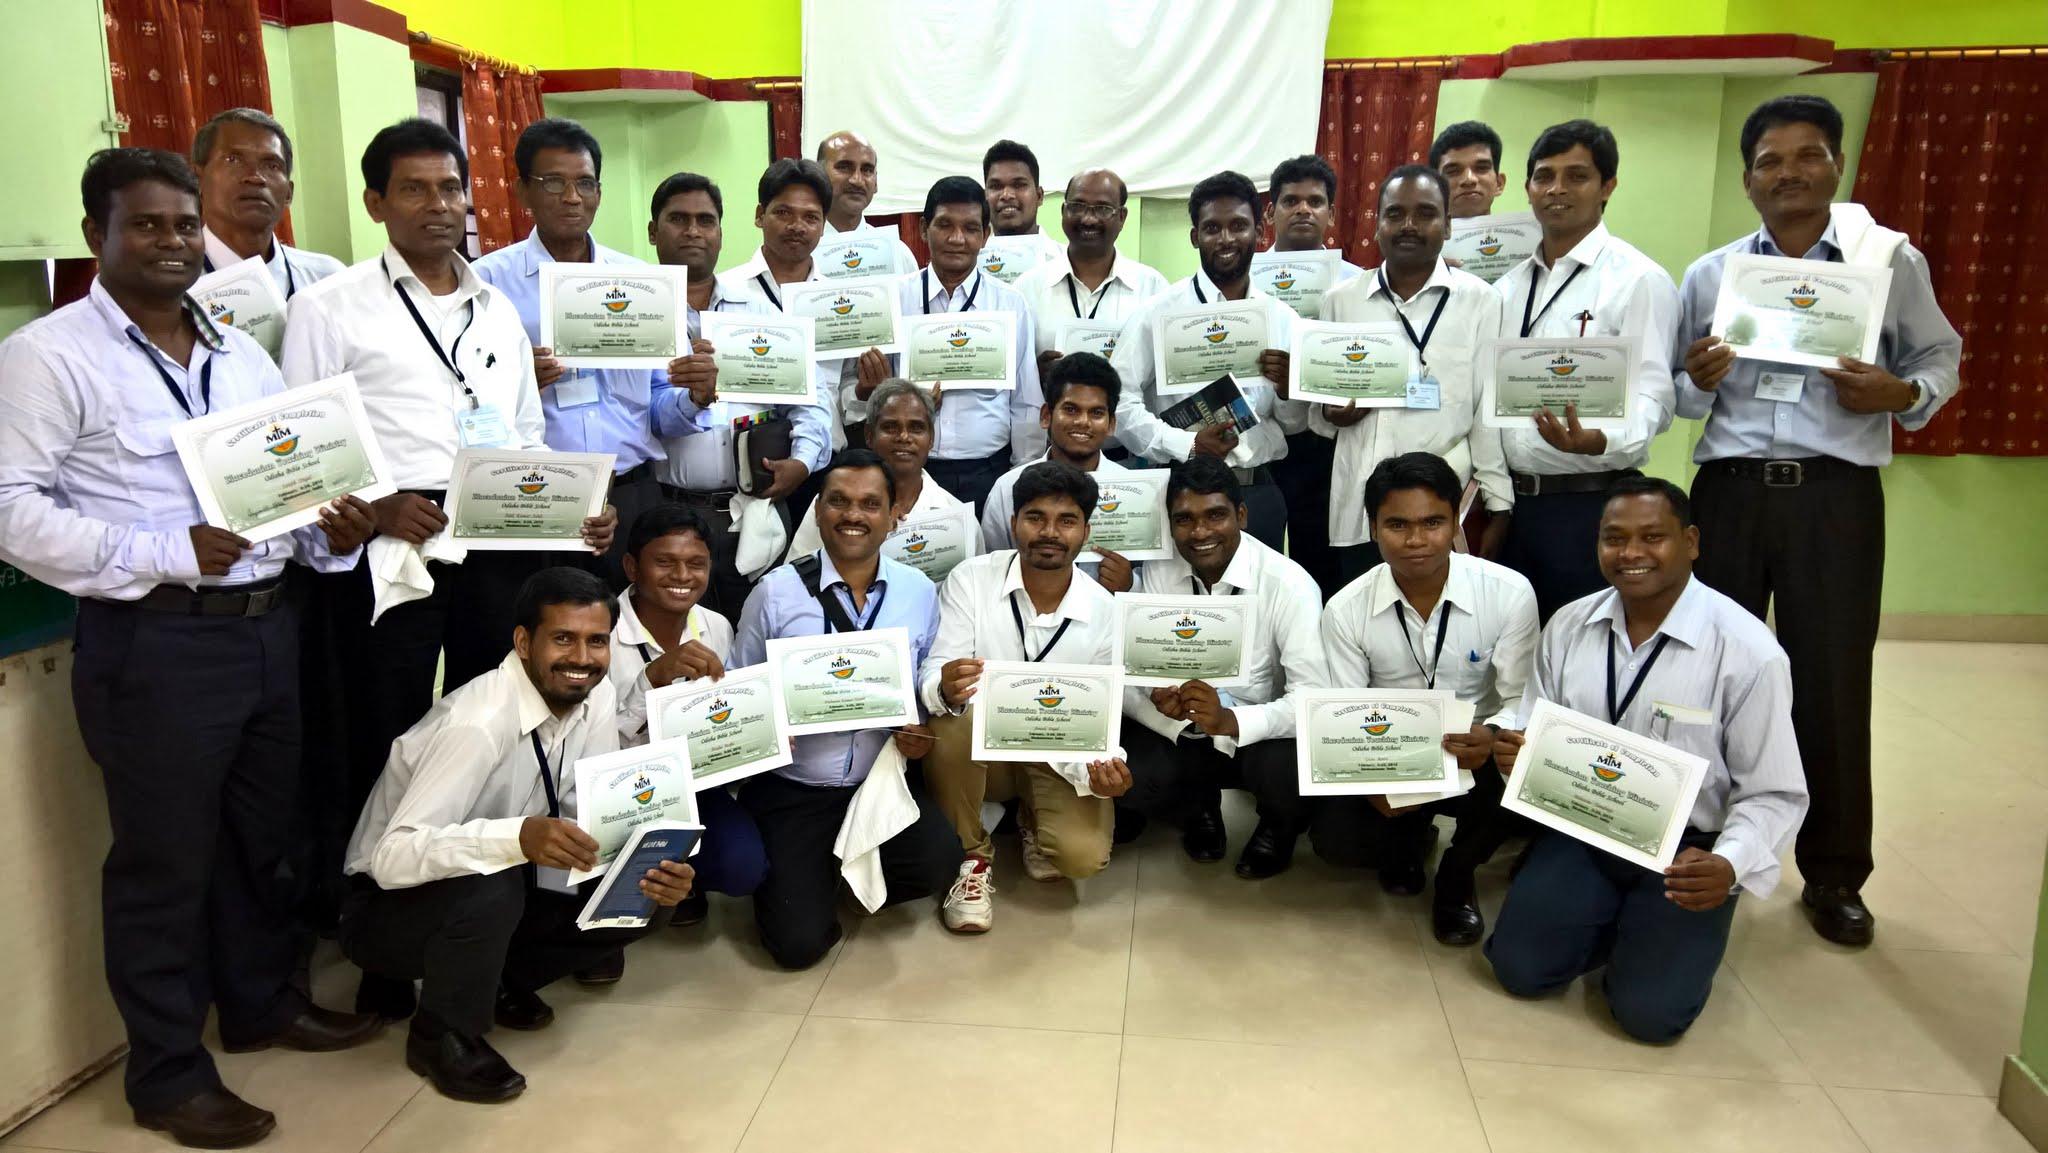 Photo: The first MTM three-week Odisha Bible school graduating class of 25 dedicated pastors and emerging church leaders.